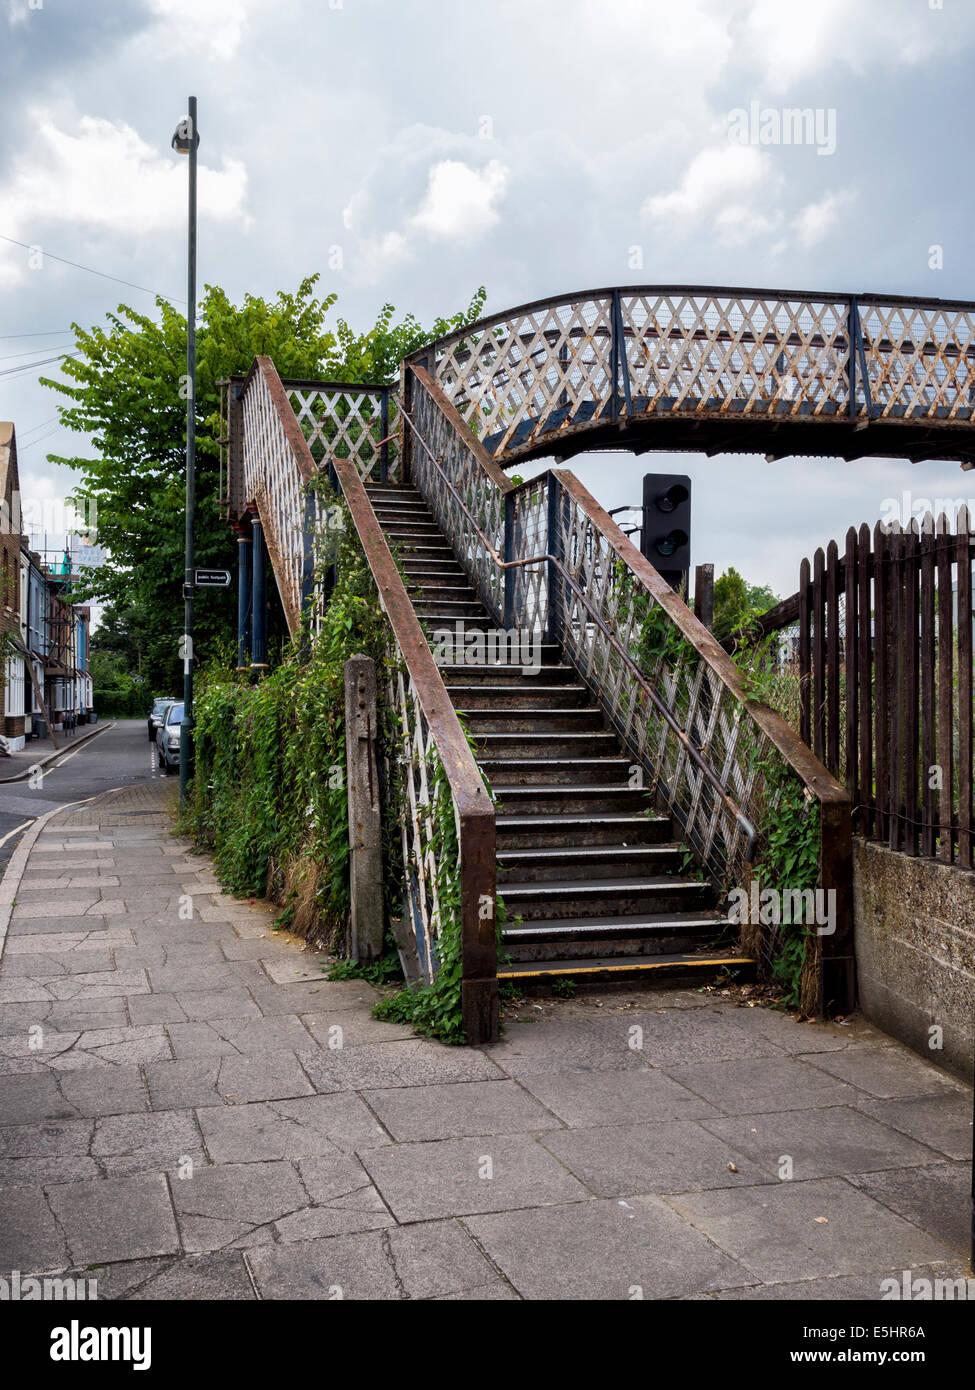 Pedestrian bridge over the railway lines at St. Margaret's rail Station, Greater London, UK - Stock Image